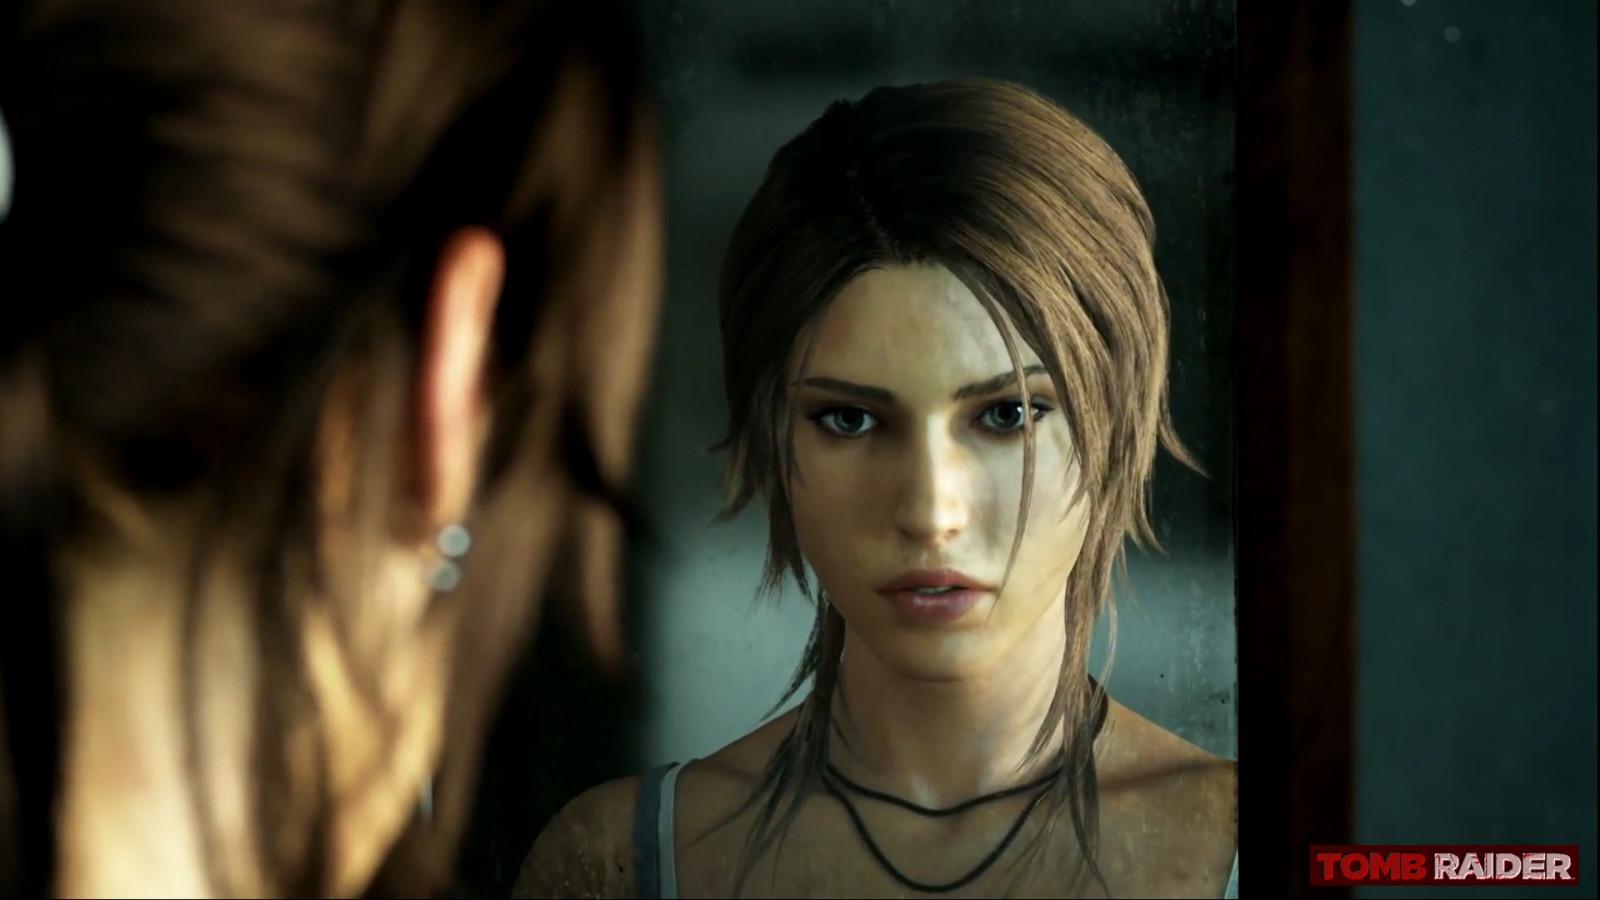 Lara croft hair nude photo